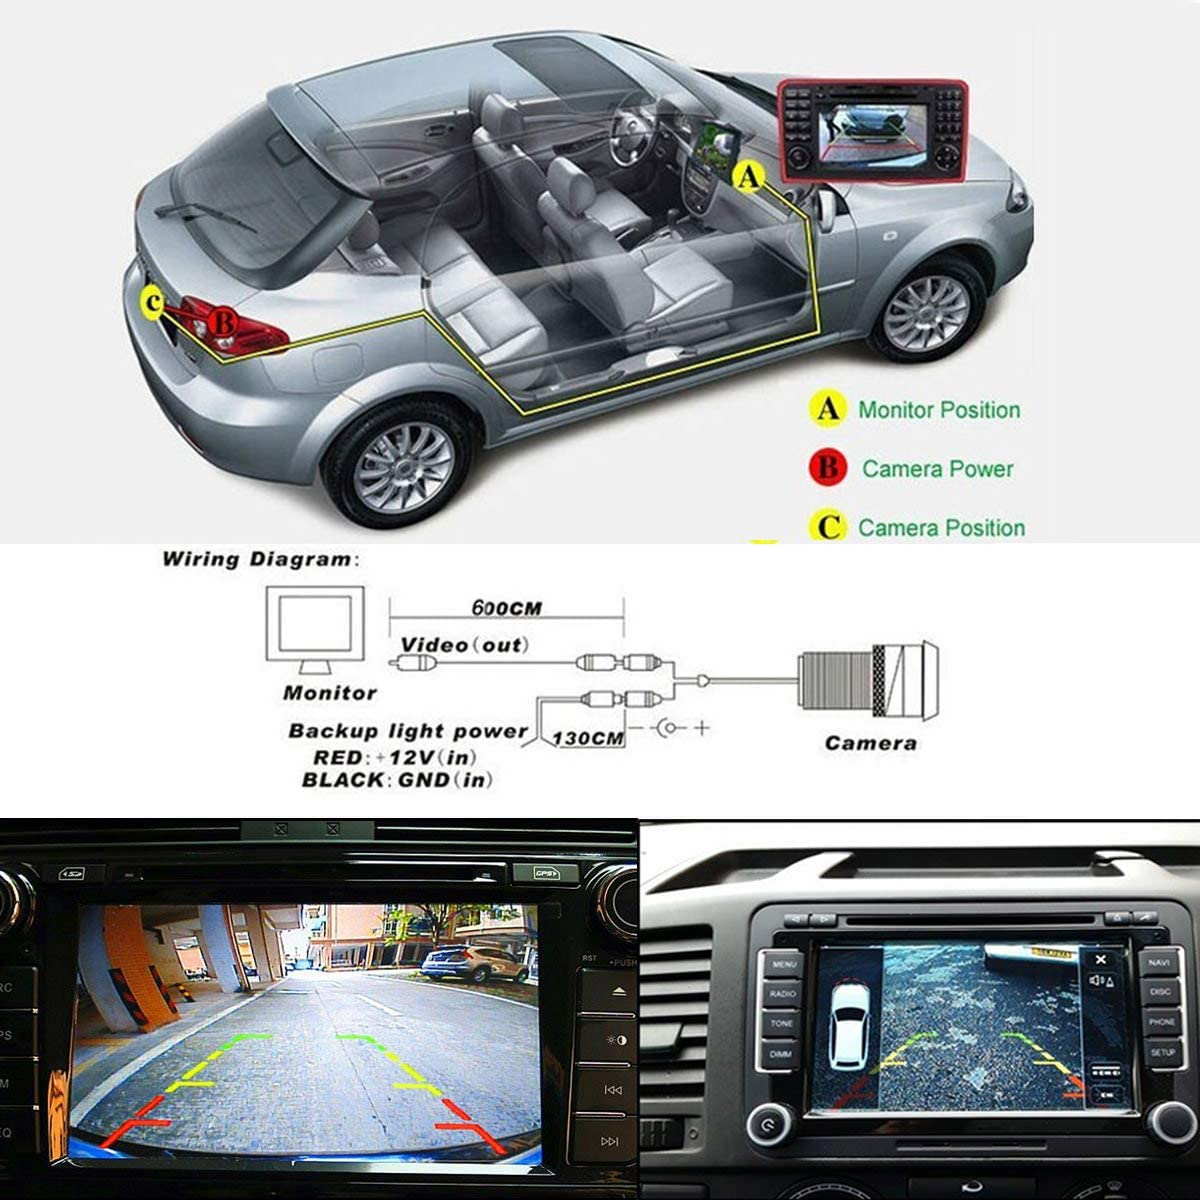 Super HD CCD Sensor Vehicle 20mm 170 Wide Angle Night Vision Rear View IP68 Reverse Backup Camera for Mercedes Benz MB100 ML320 ML350 ML300 ML250 ML63 W164 ML450 GL320